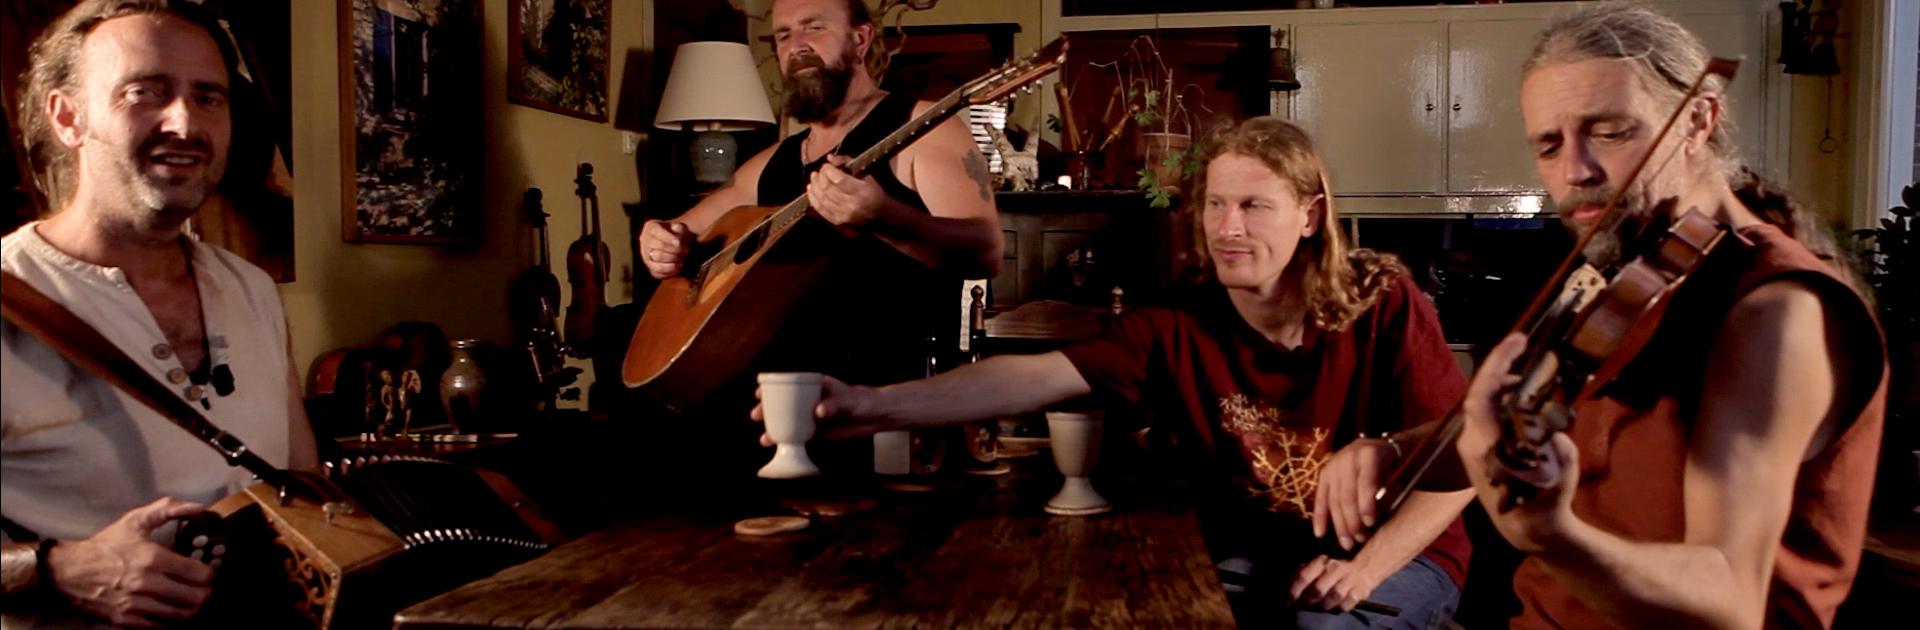 Stad-Amsterdam-rapalje-celtic-folk-music